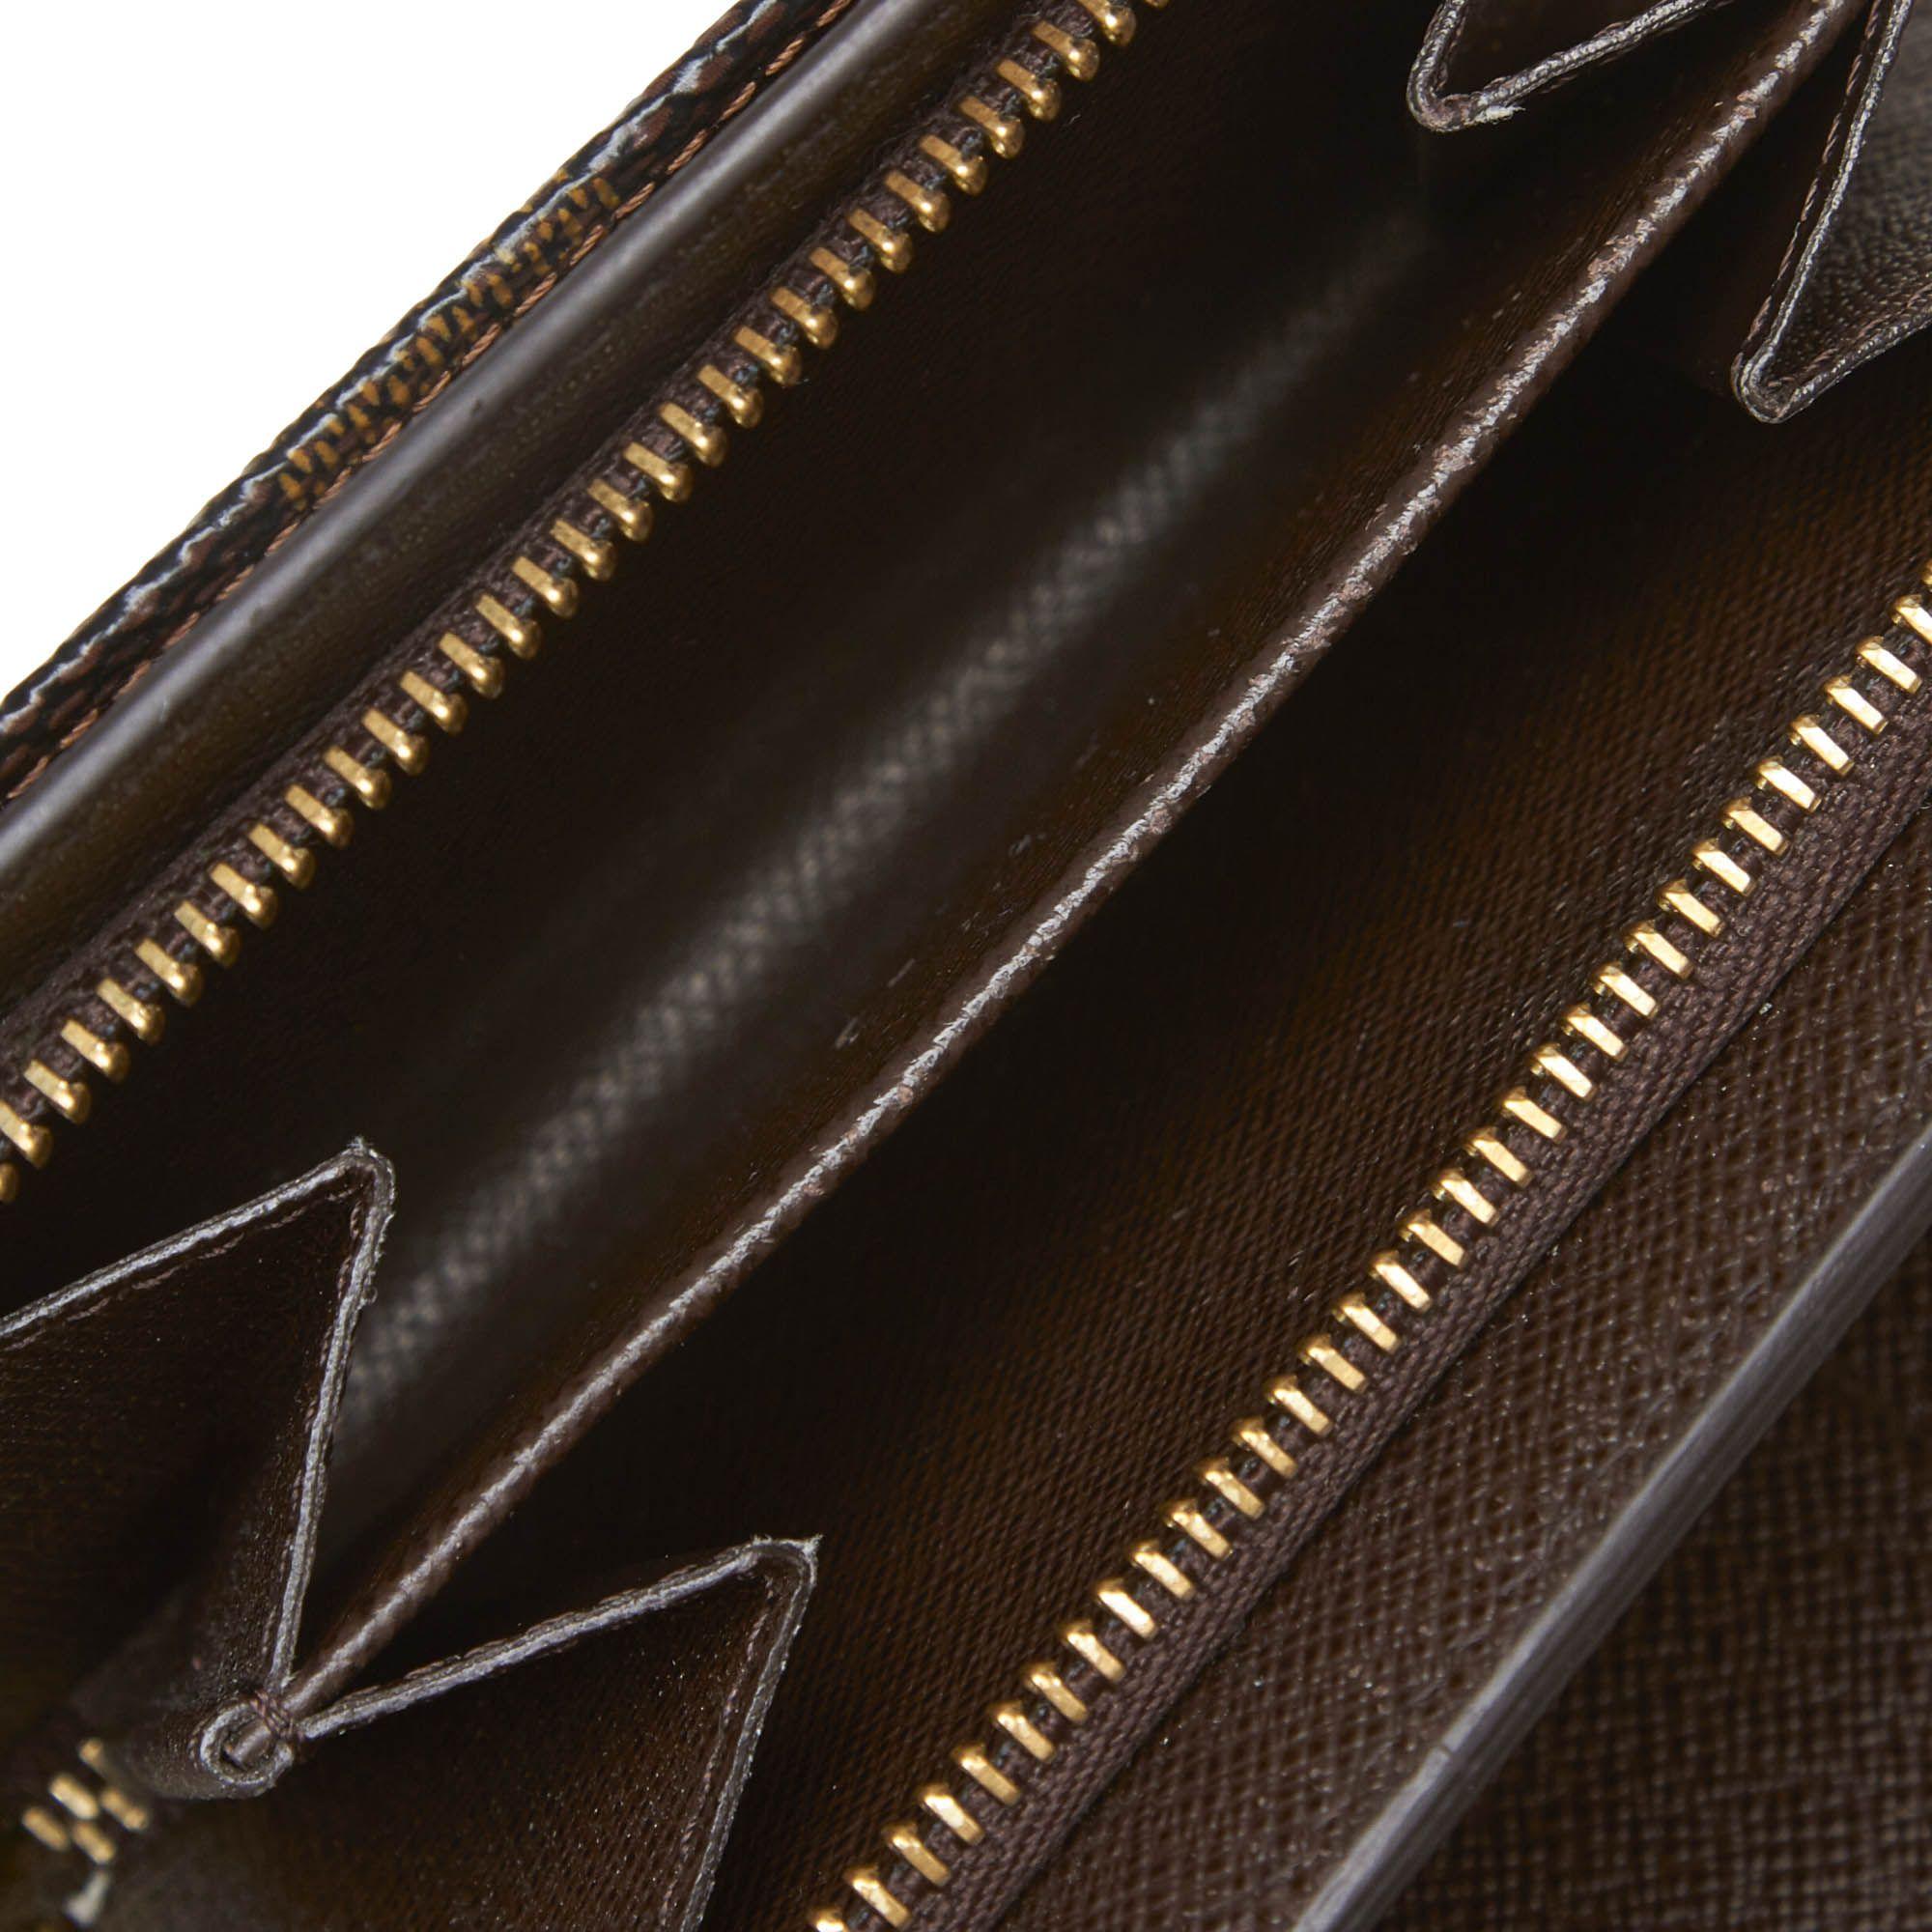 Vintage Louis Vuitton Damier Ebene Joey Brown